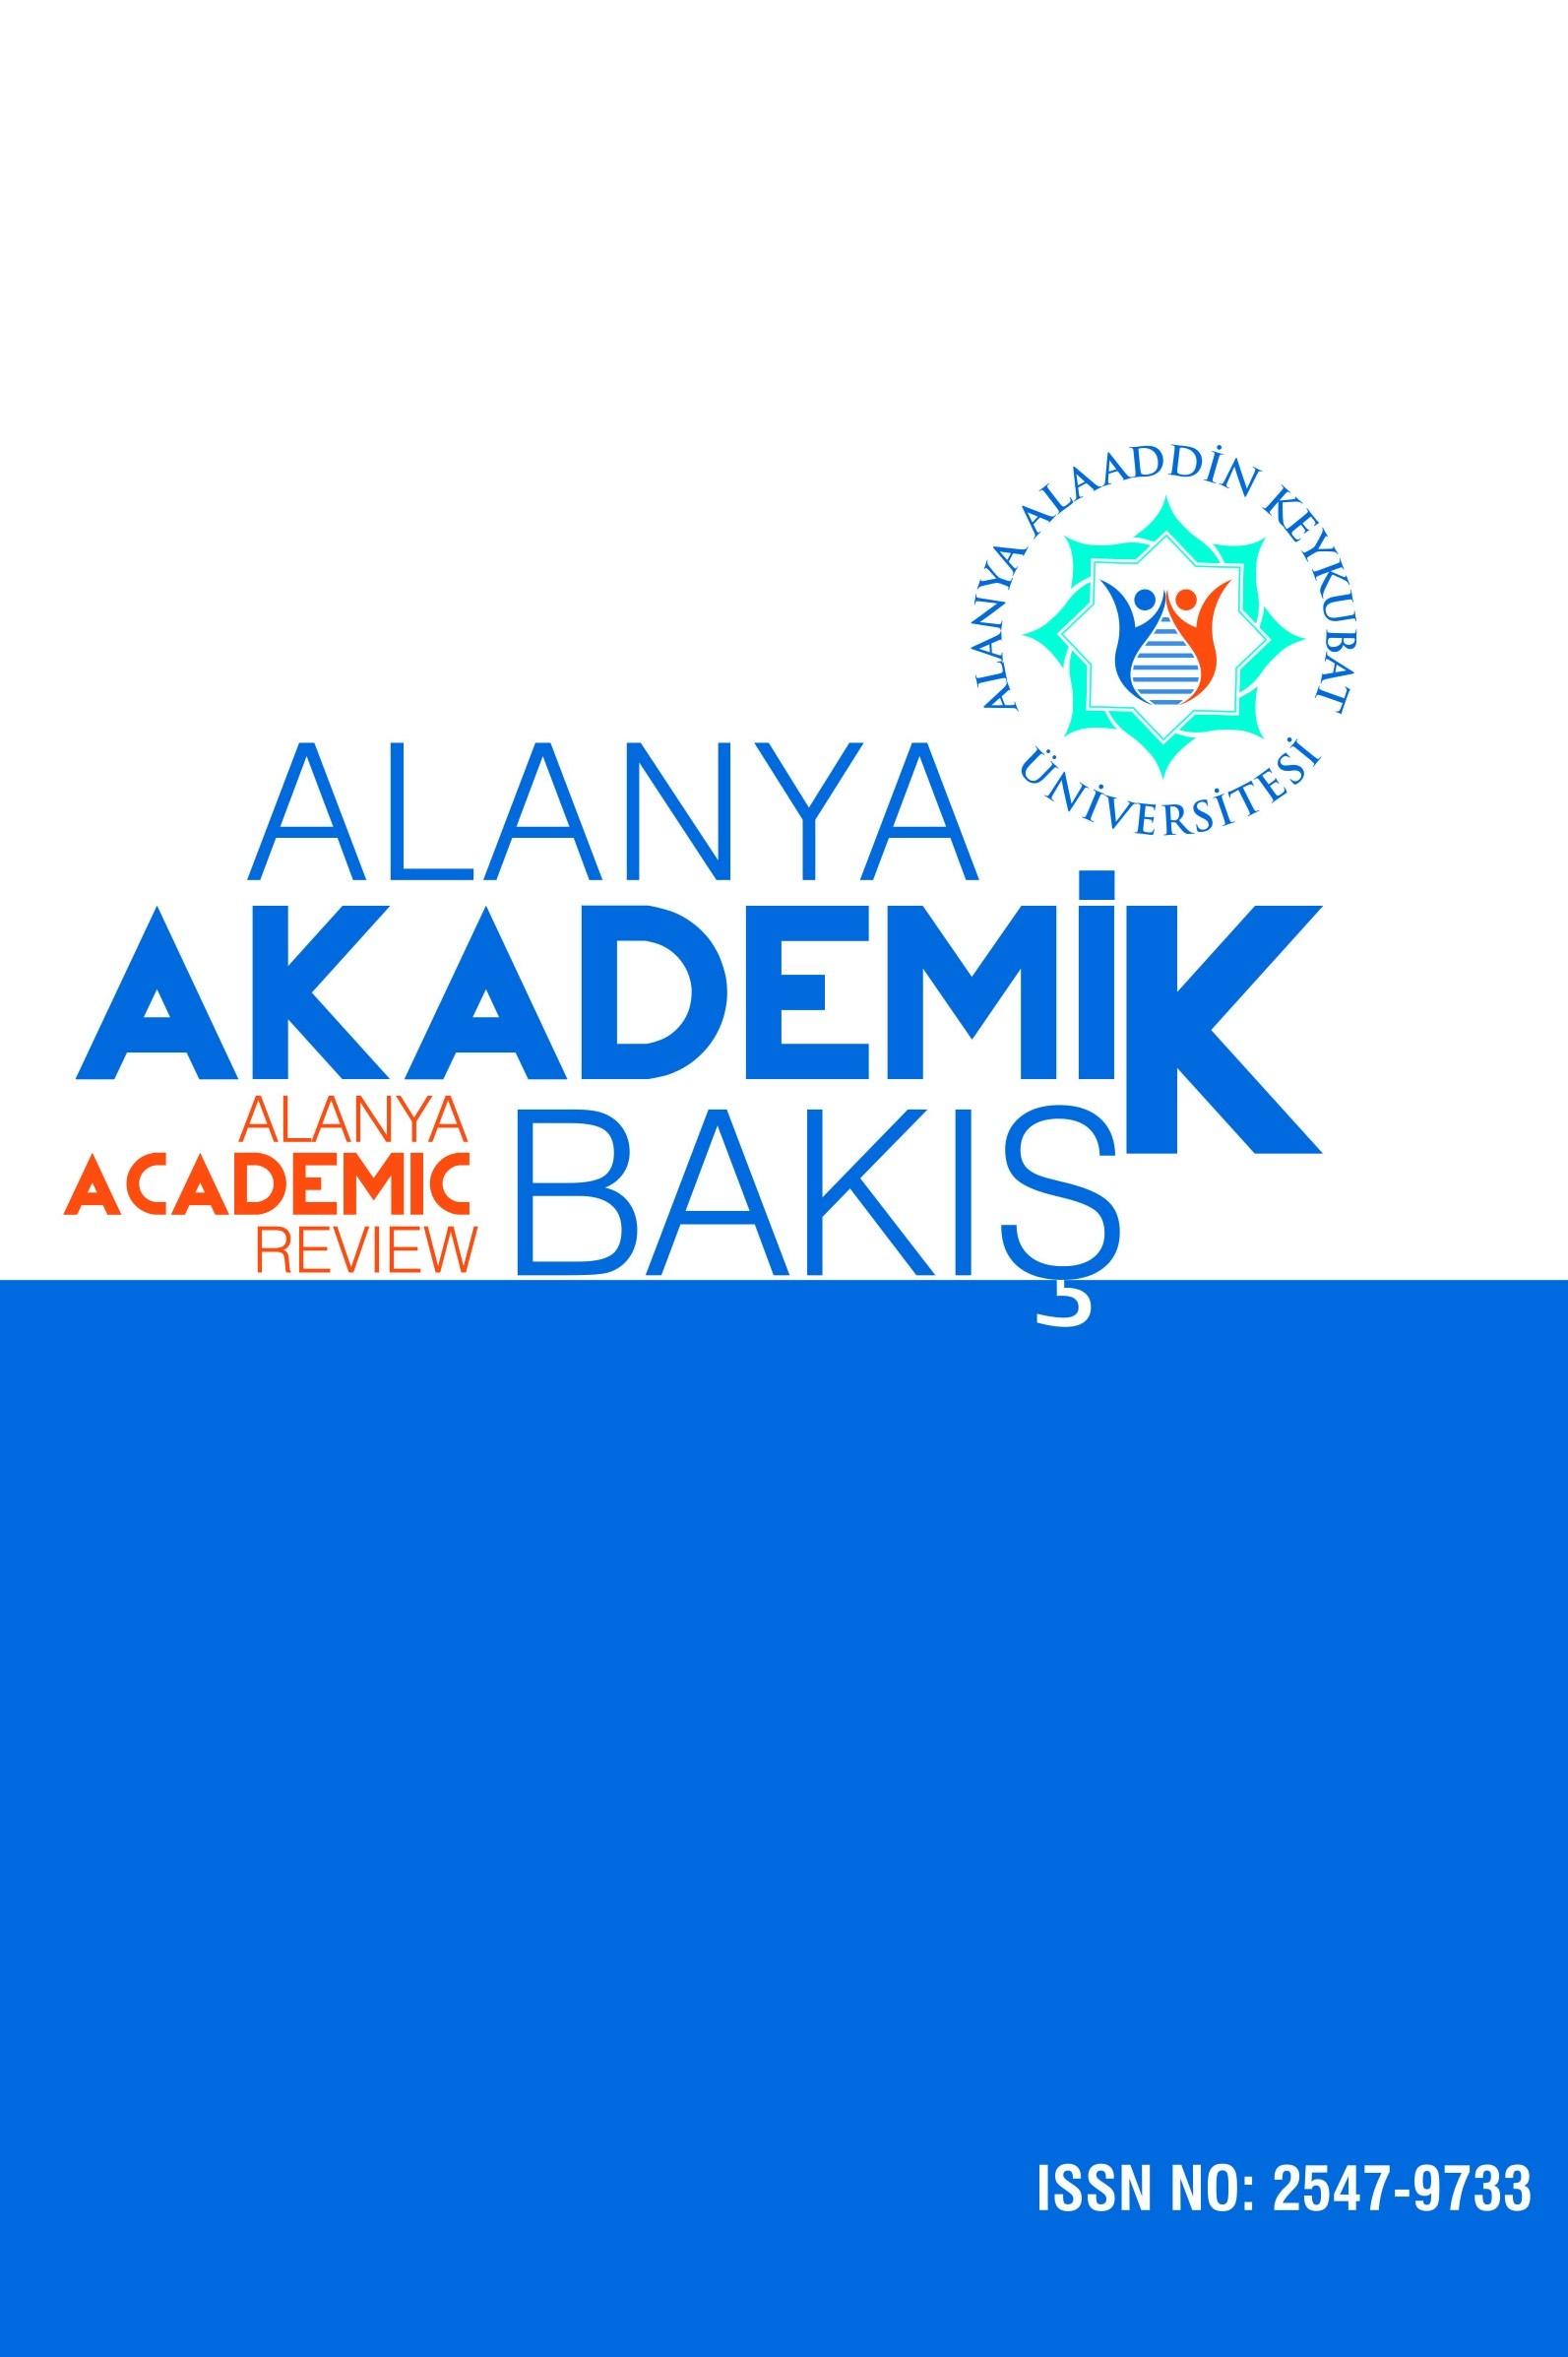 Alanya Academic Review